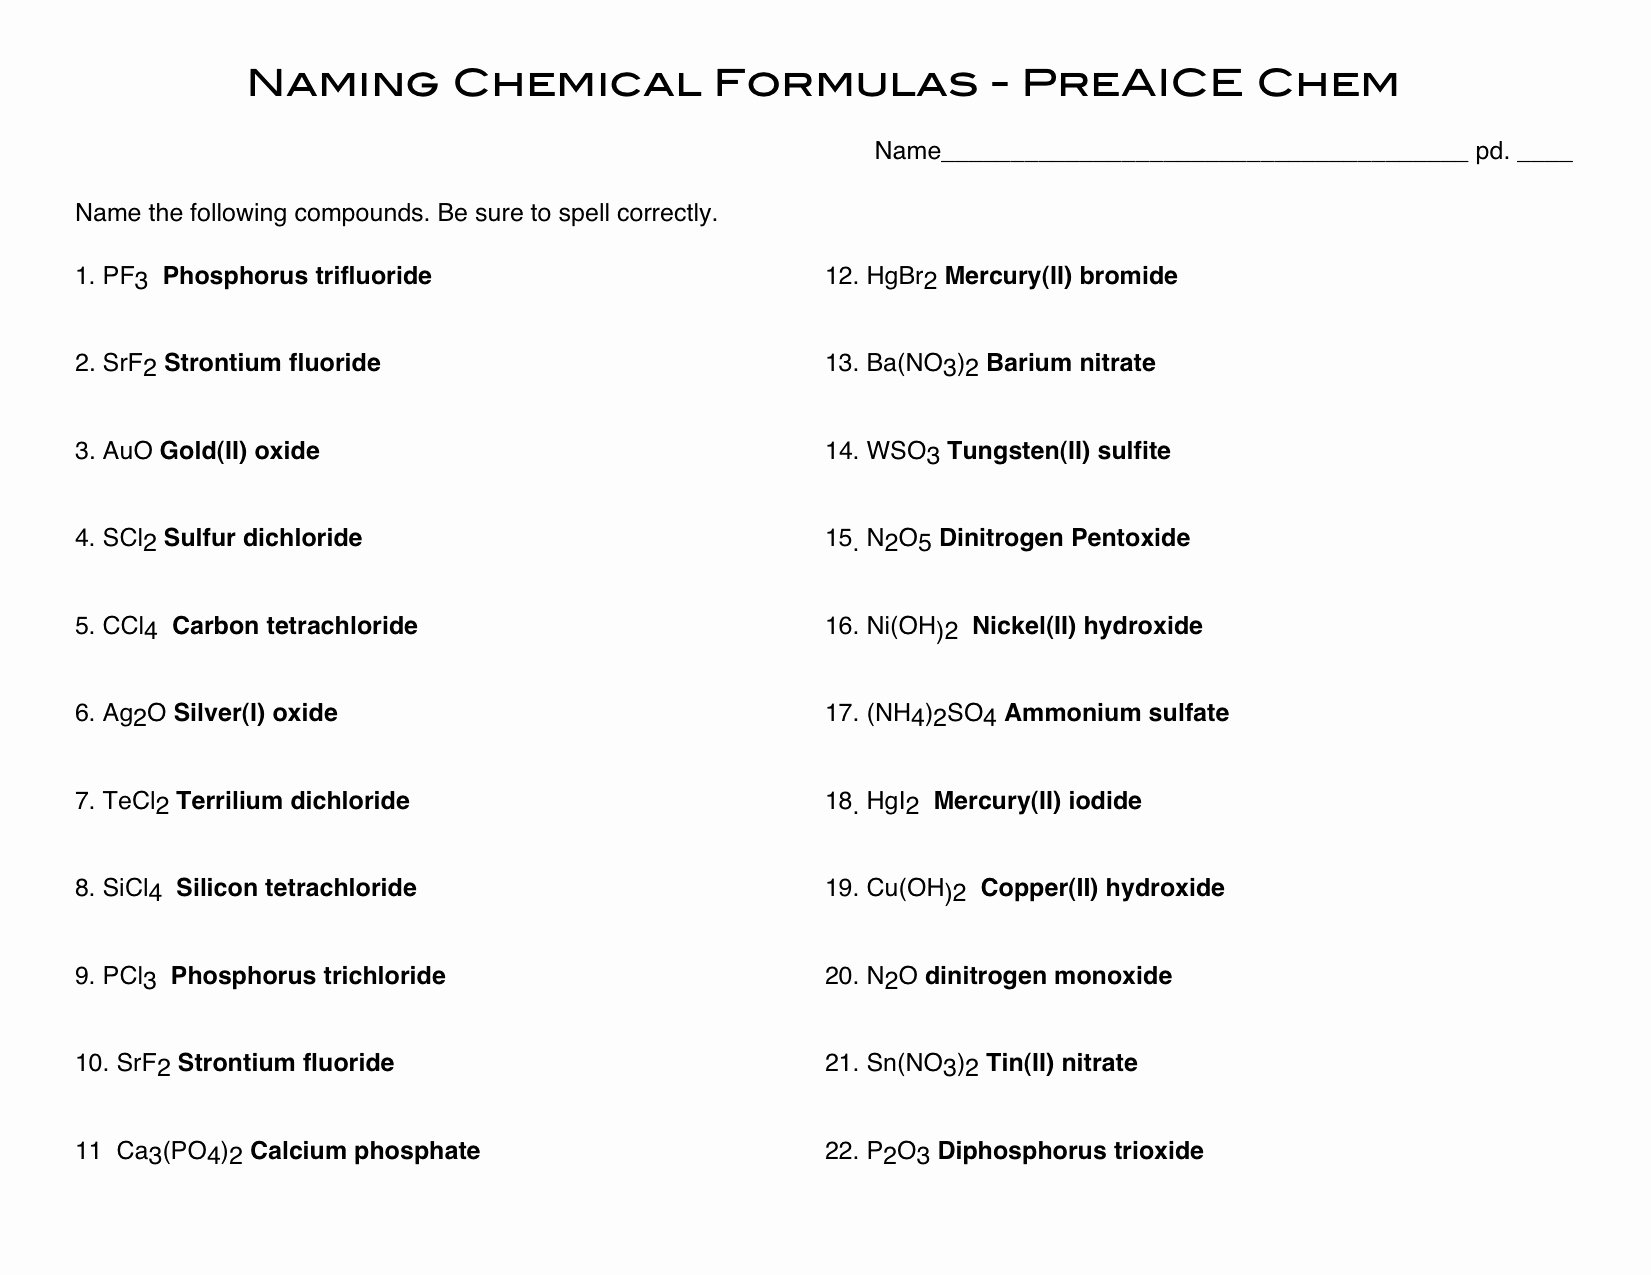 50 Chemical Formula Worksheet Answers